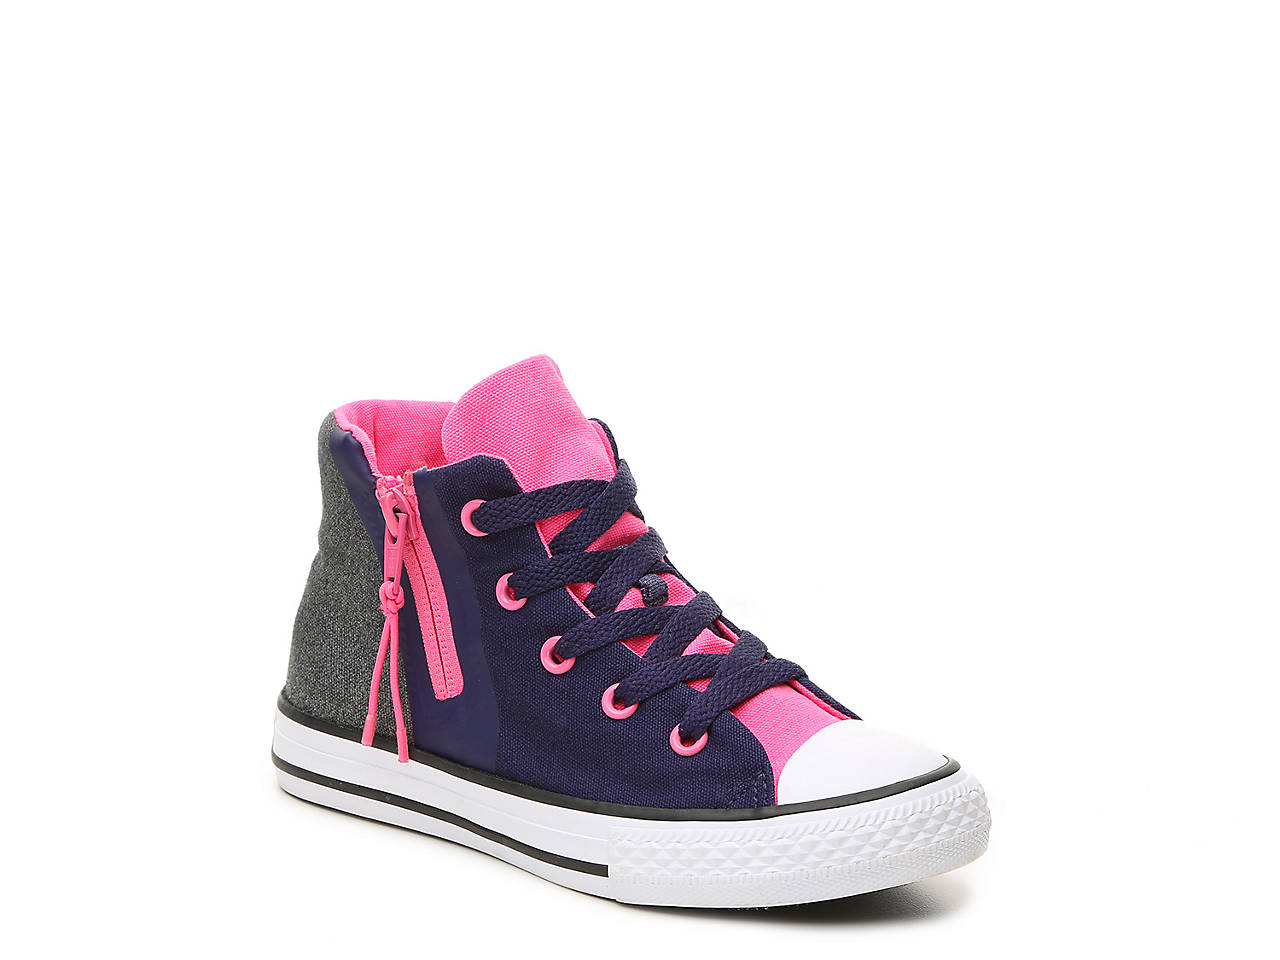 3c411d793219 Converse. Chuck Taylor All Star Sport Zip Toddler   Youth High-Top Sneaker